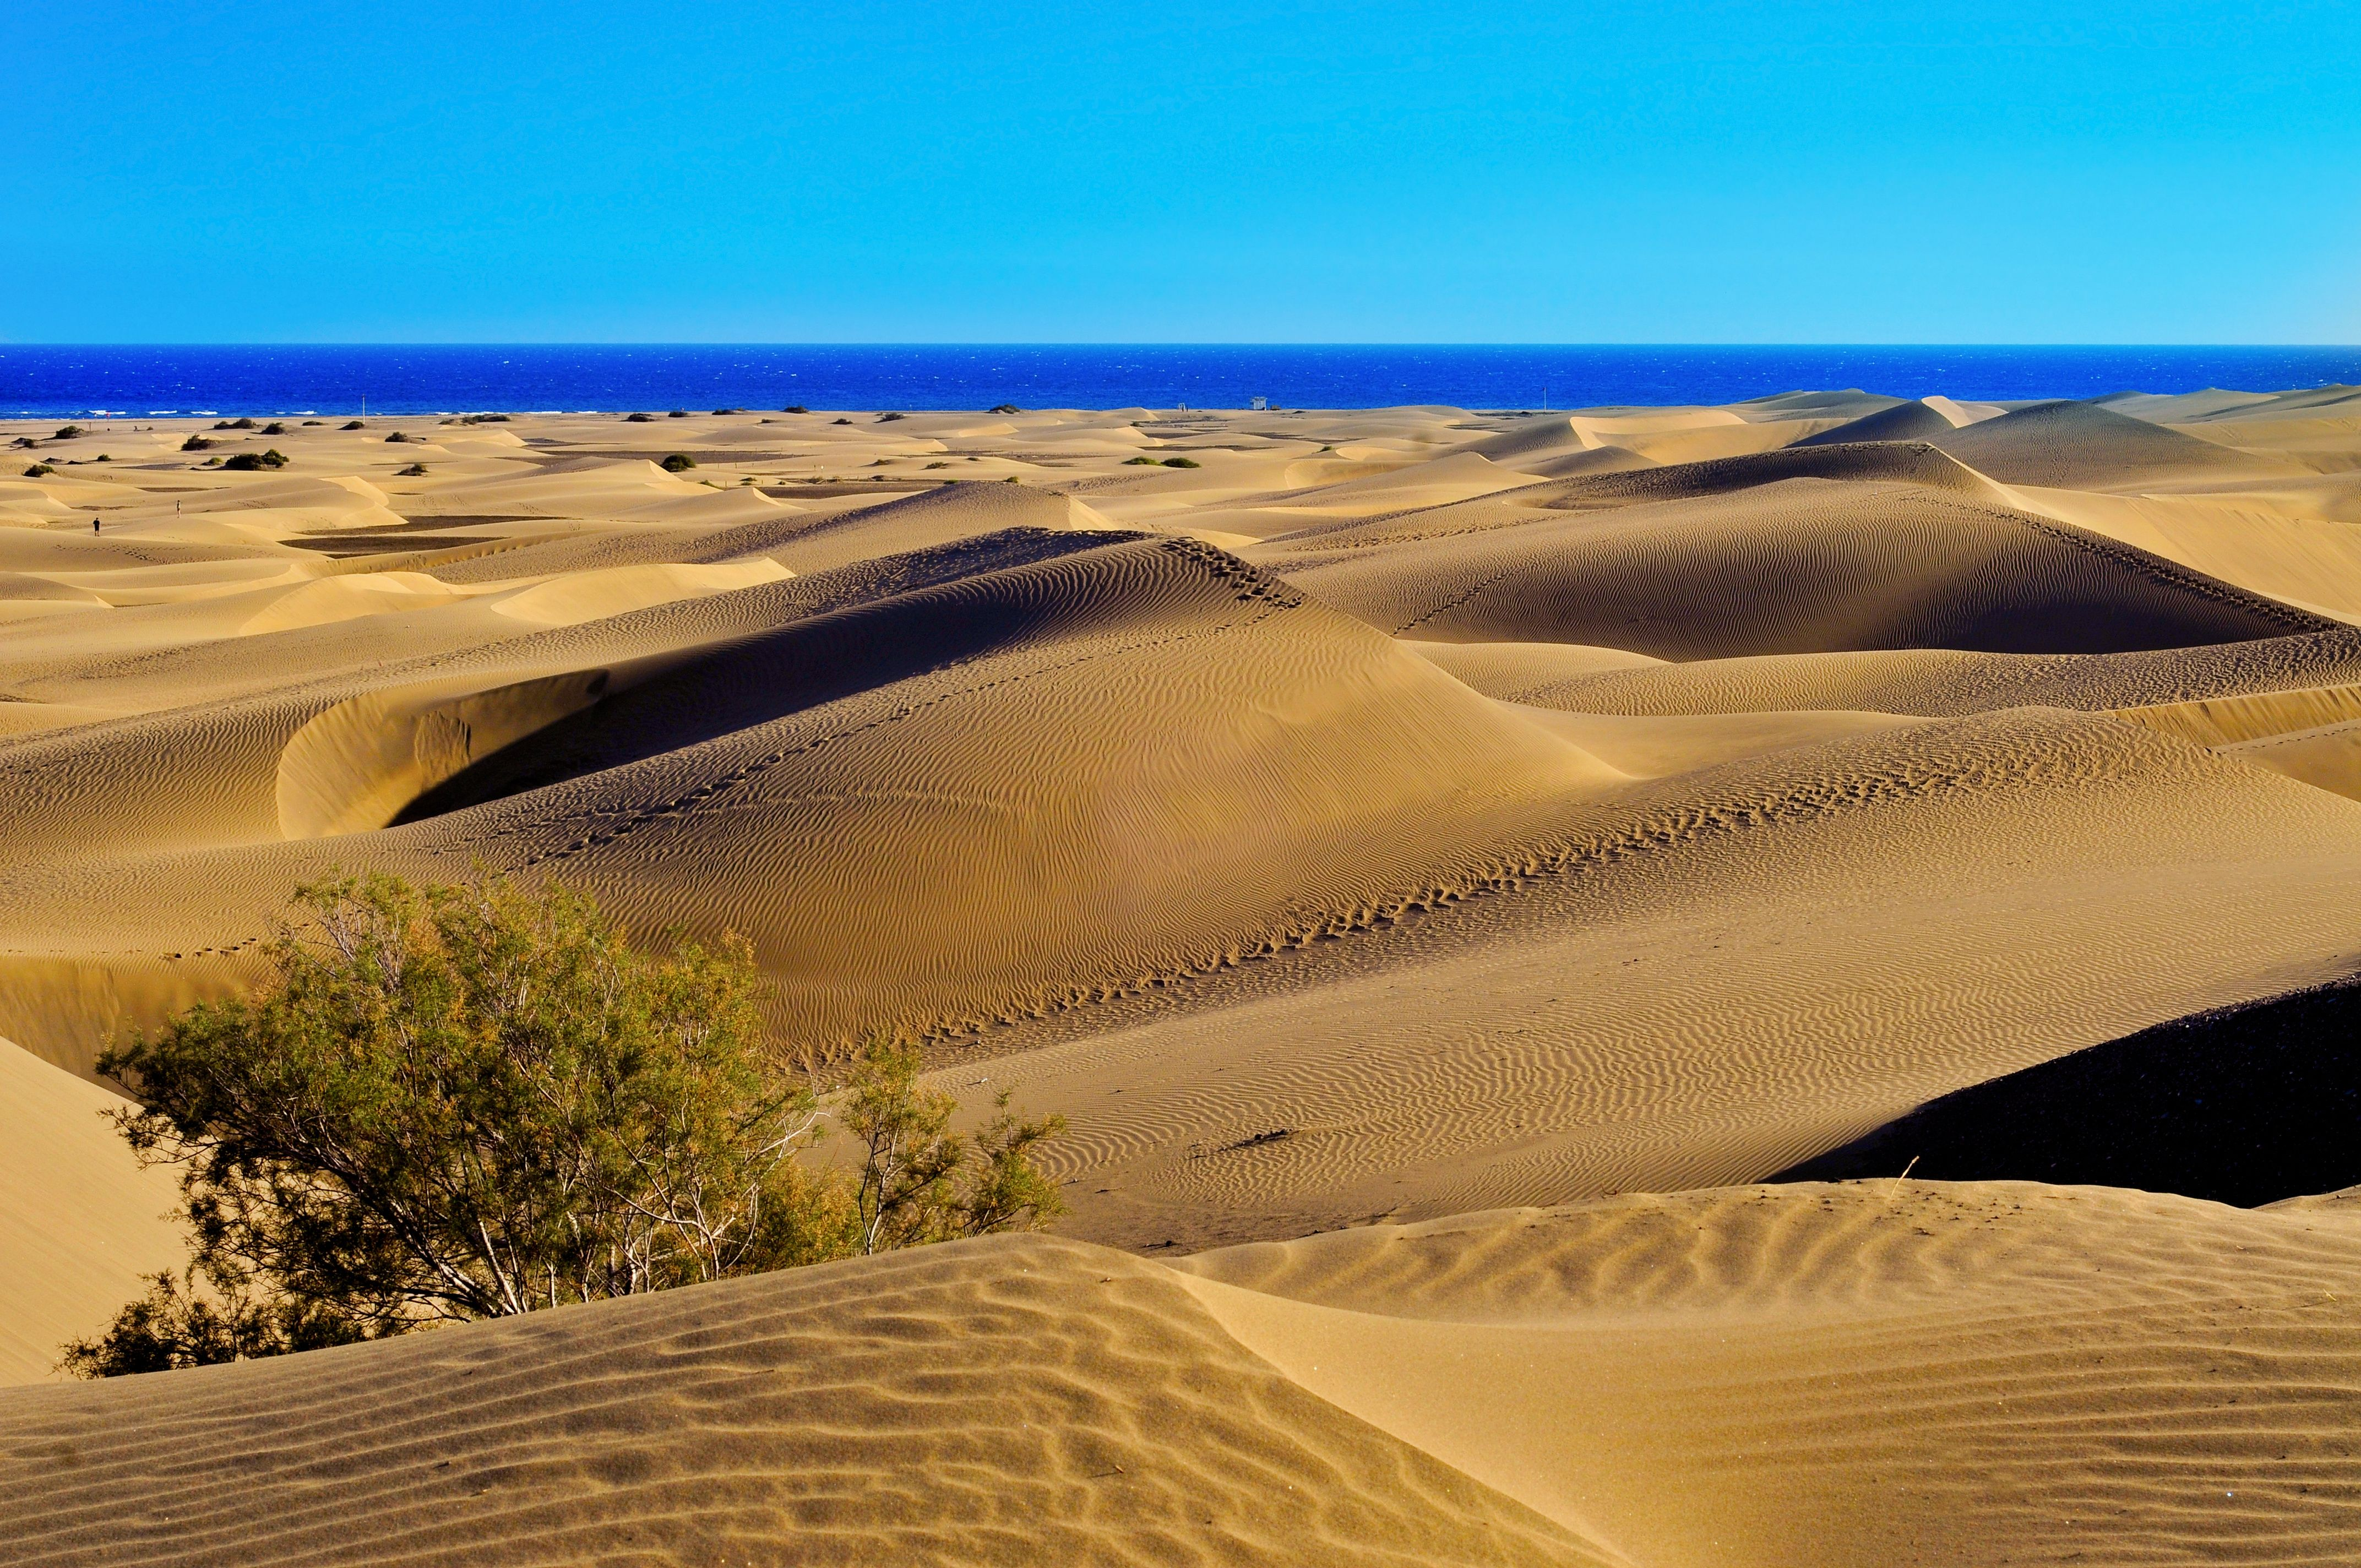 Natural reserve of dunes of Maspalomas, Gran Canaria #